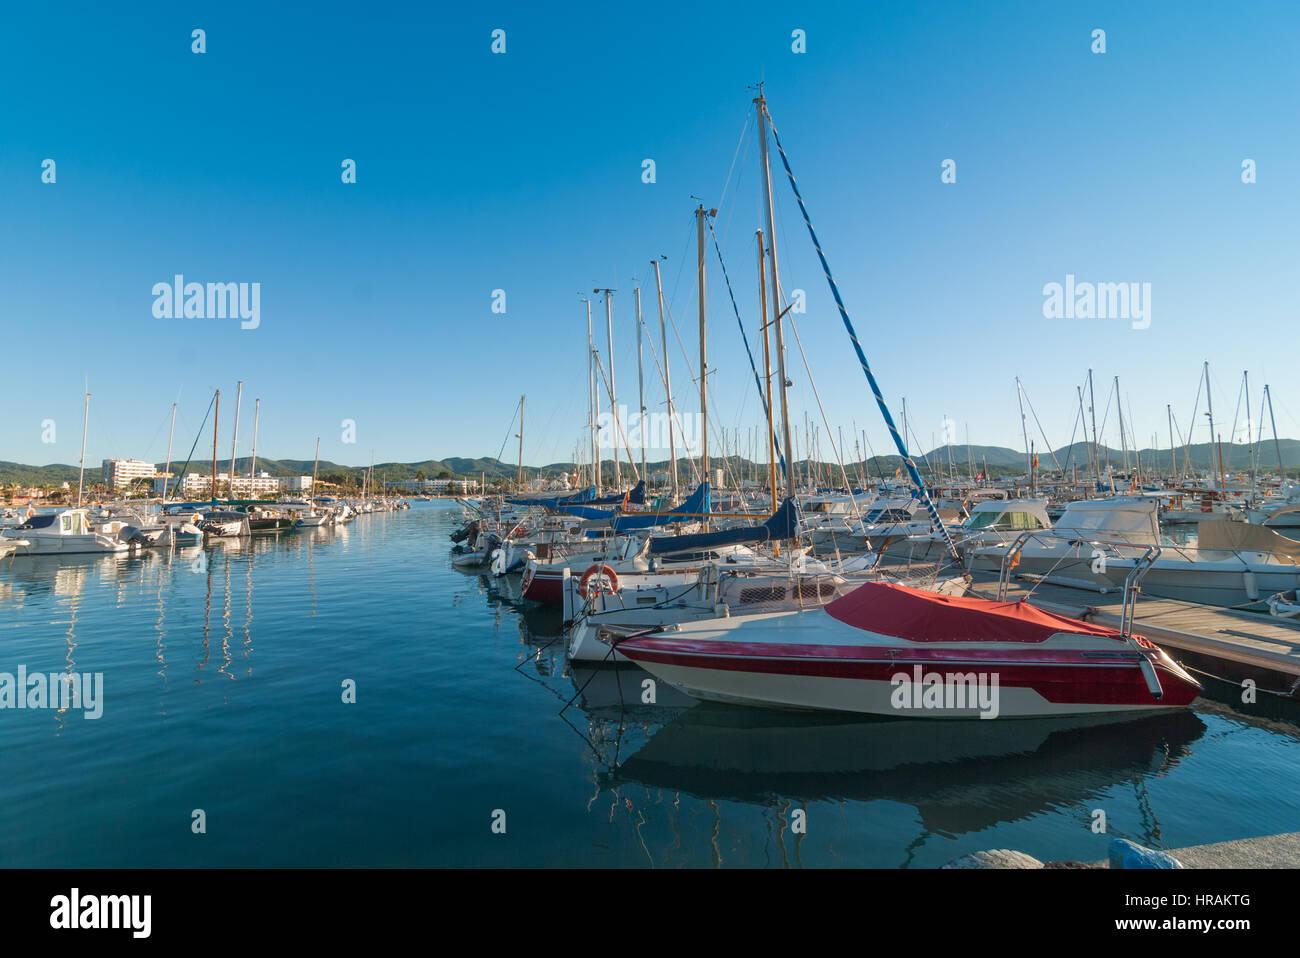 Soleil d'Ibiza en fin d'après-midi à St Antoni de Portmany, Ibiza, Espagne. Rangée de motomarines, Photo Stock